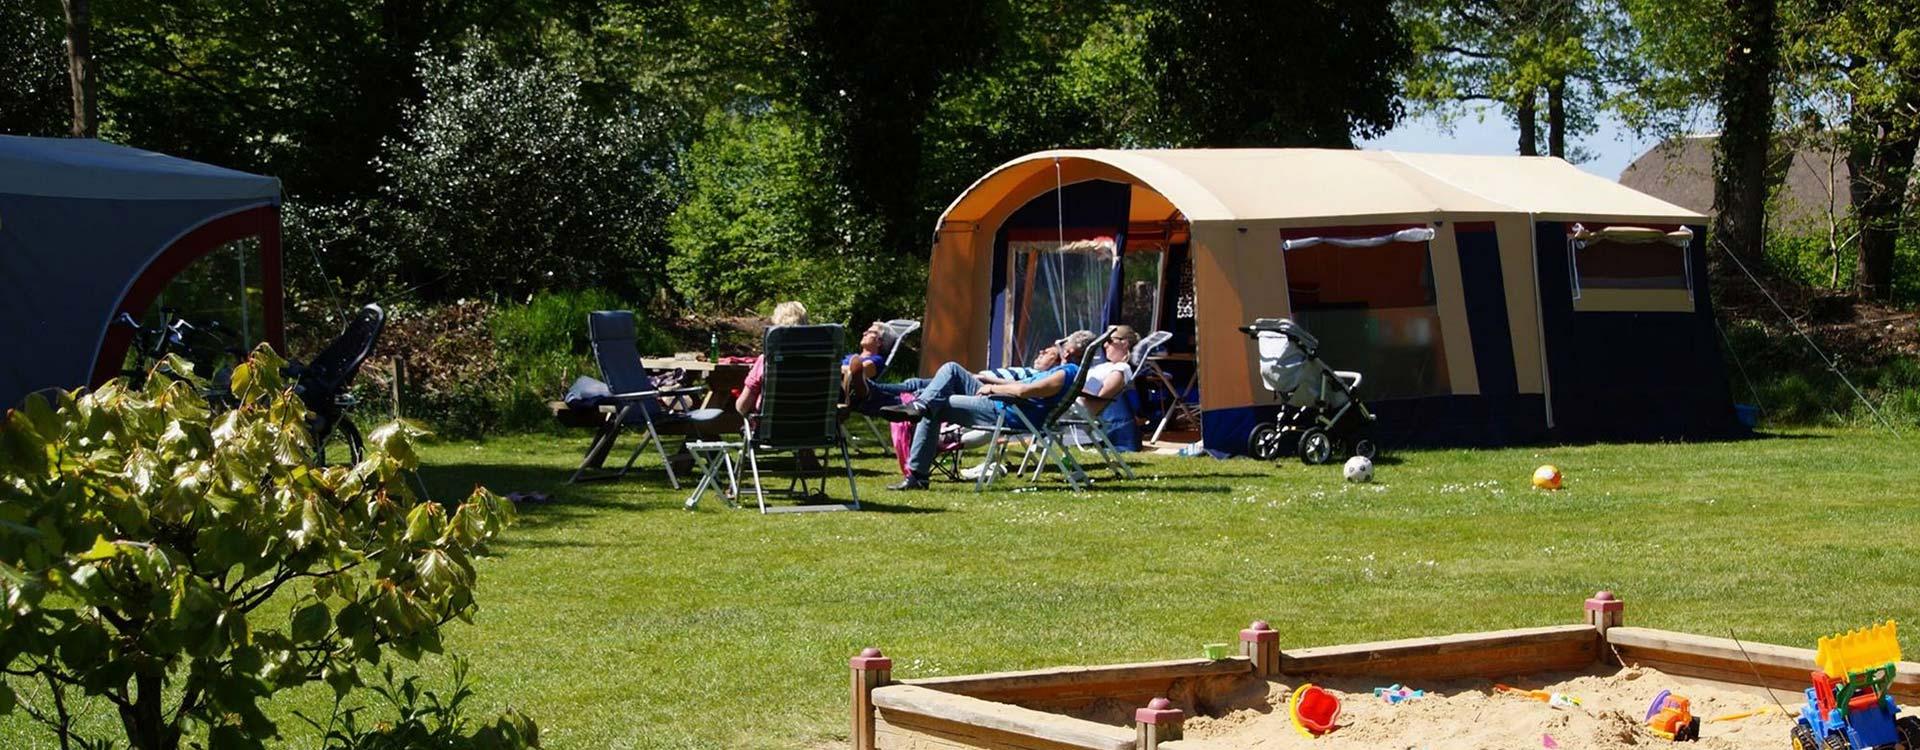 camping-meistesrhof-kamperen-in-drenthe